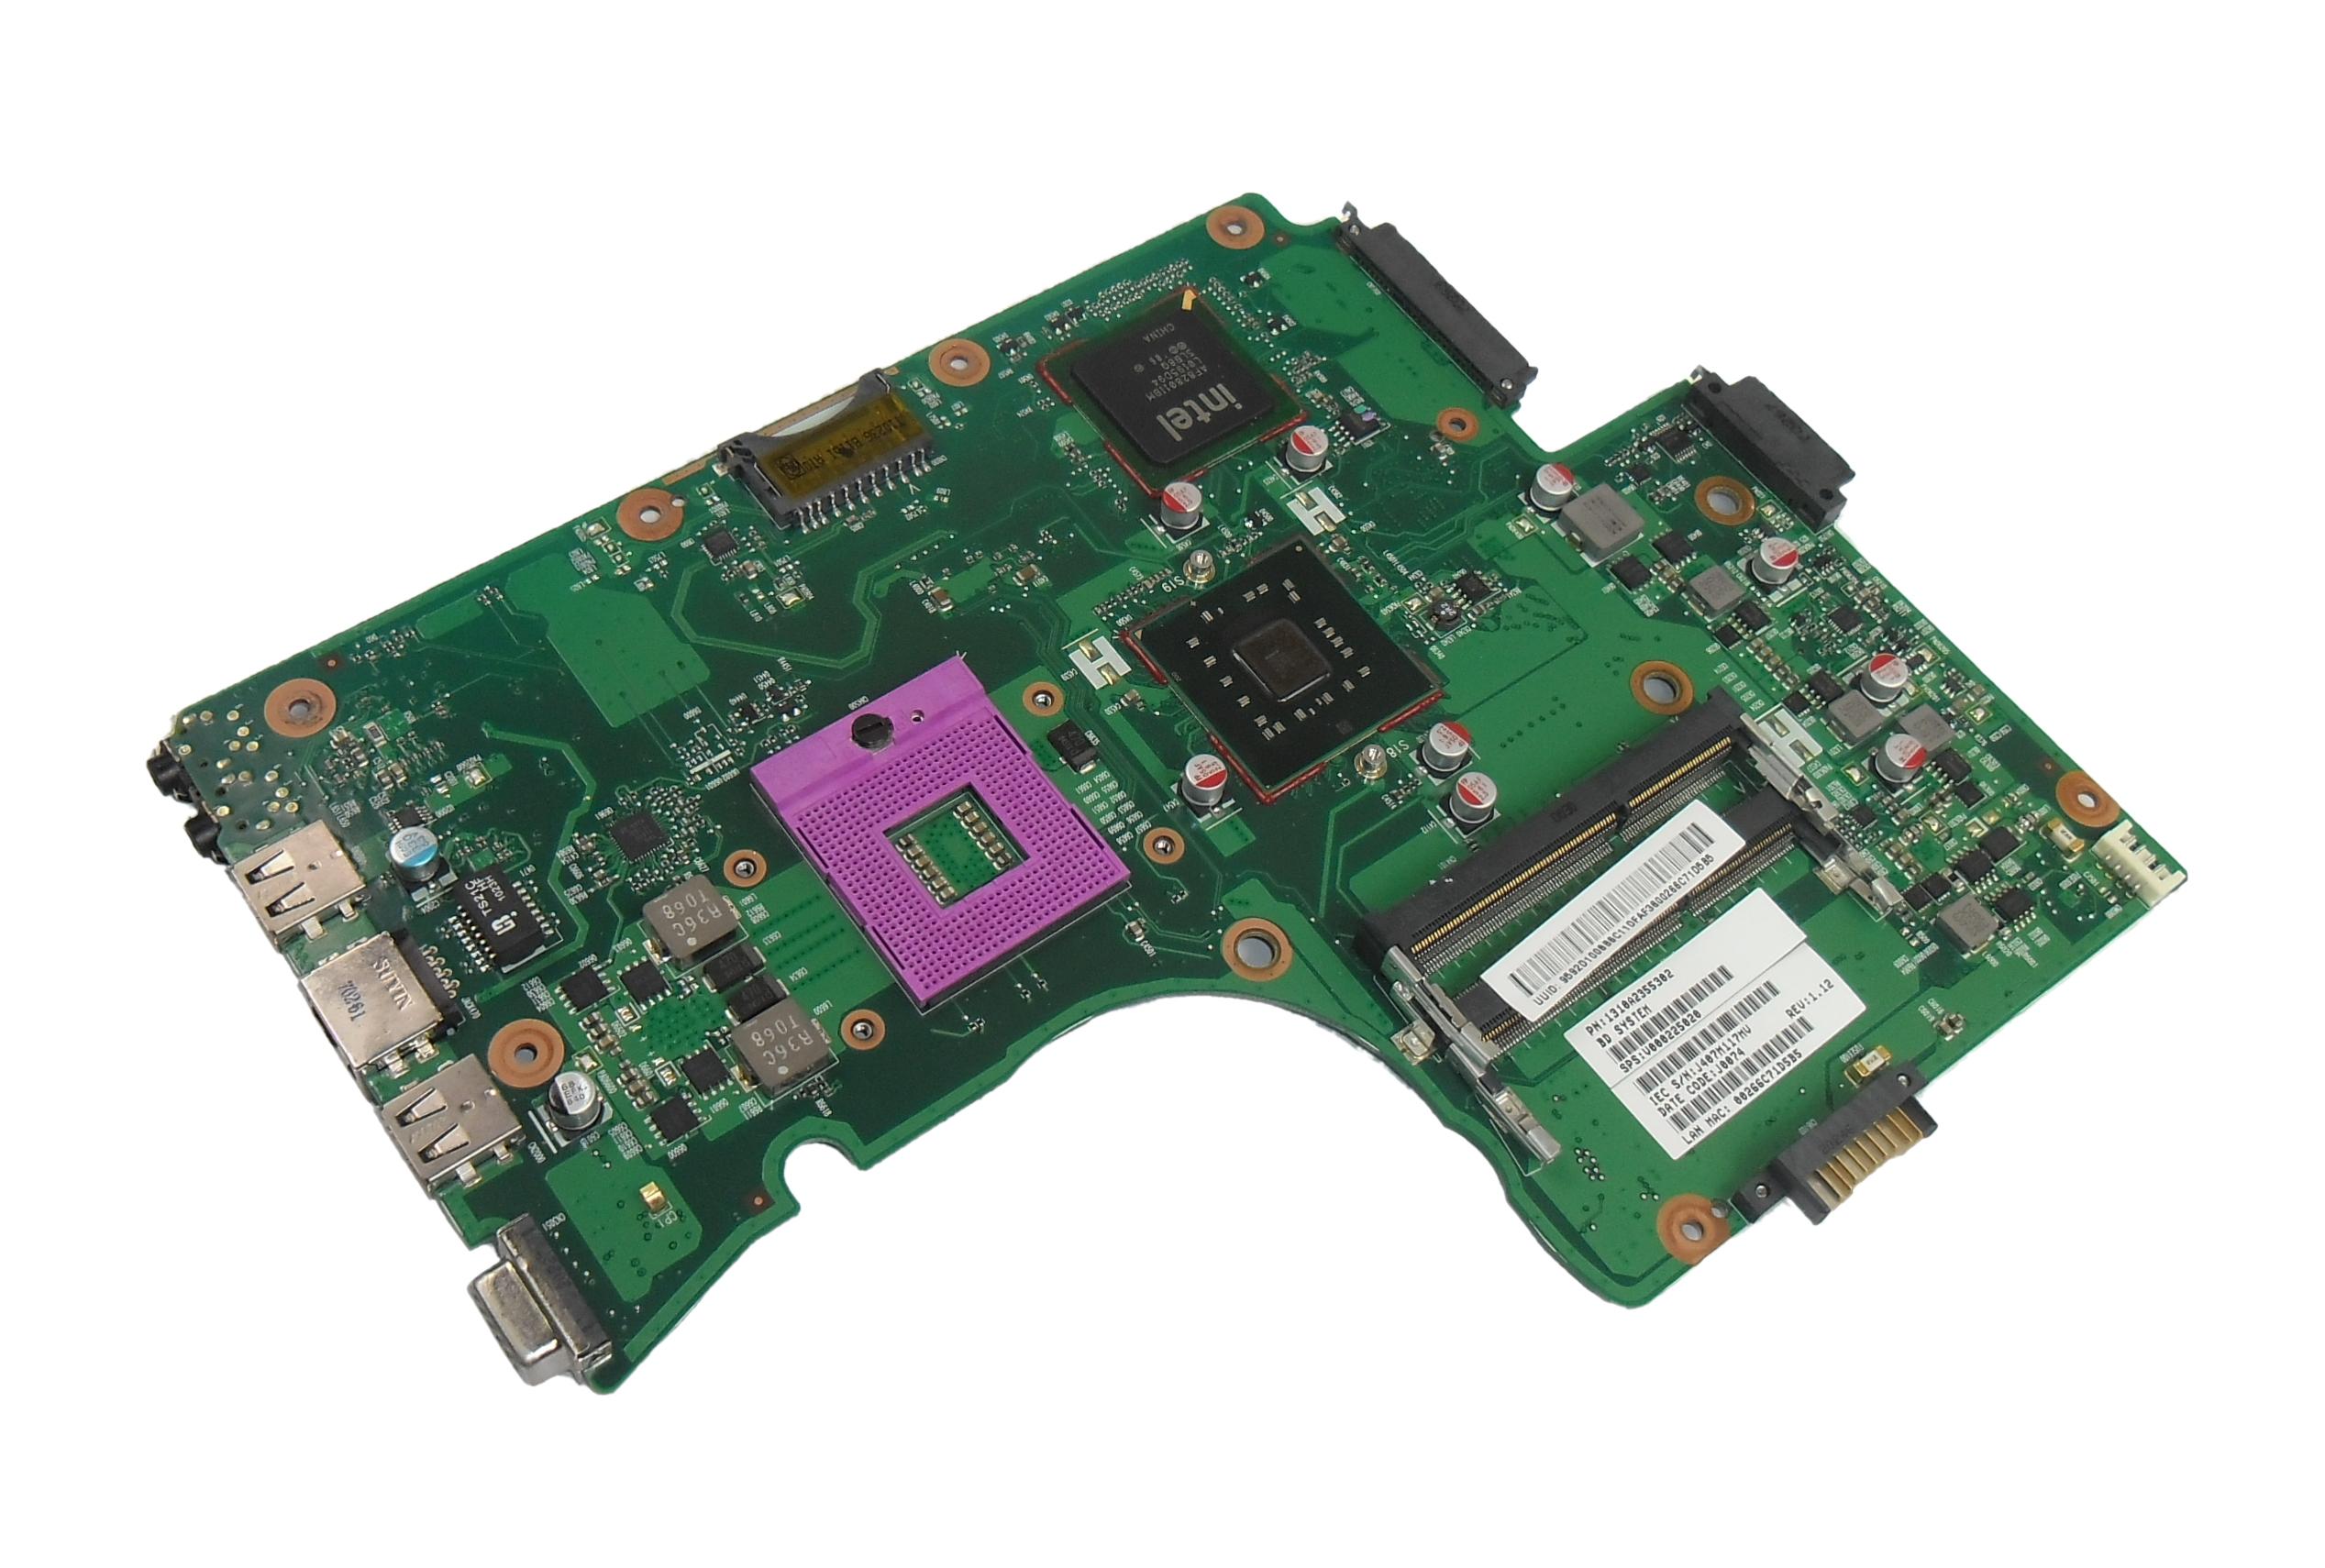 Toshiba V000225020 Satellite Pro C660 Laptop Motherboard 1310A2355302